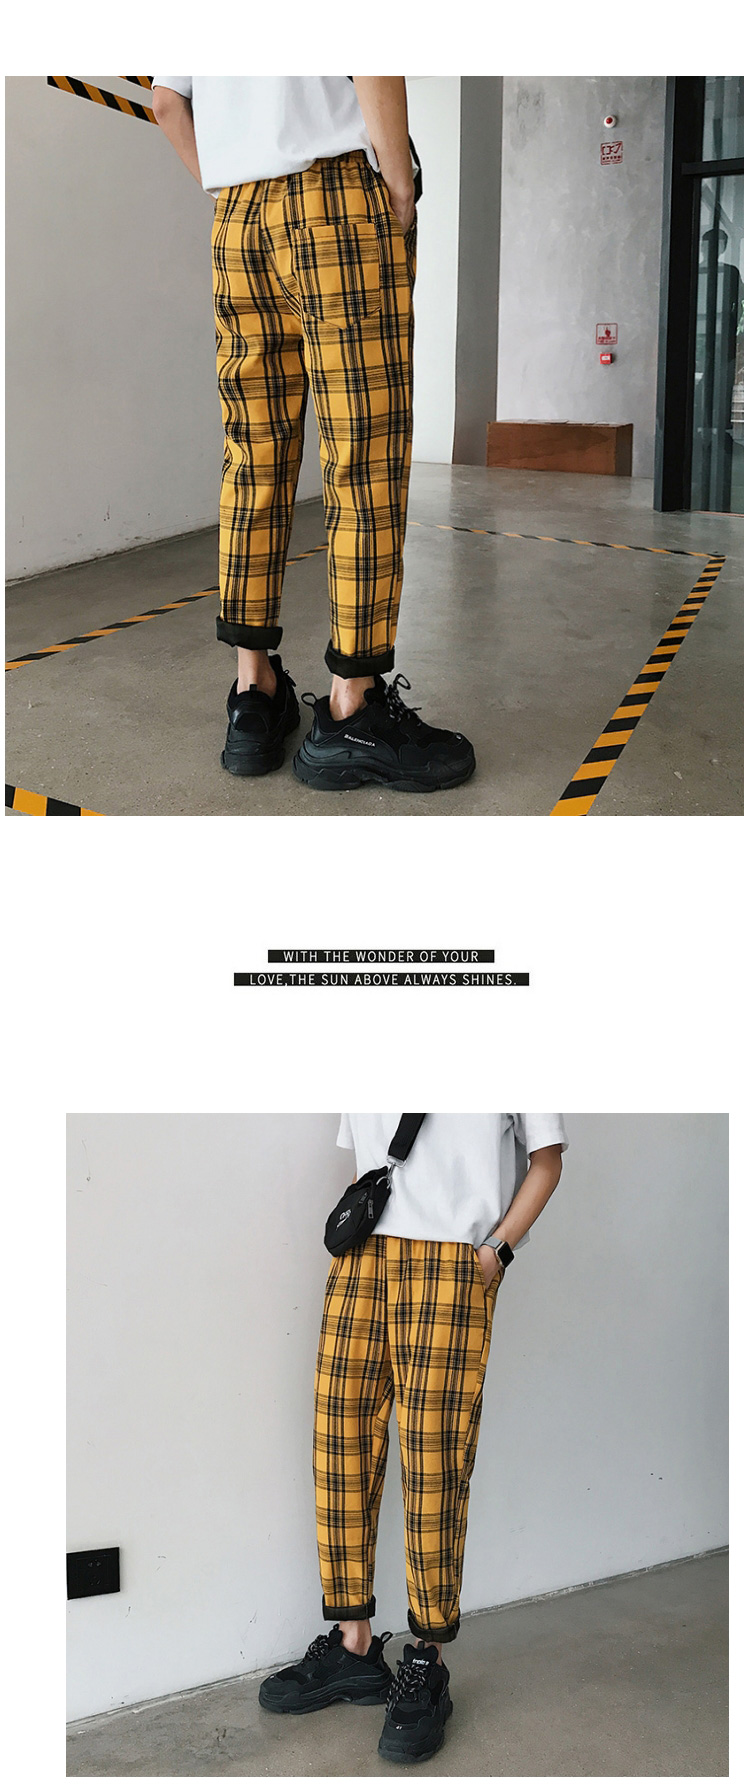 LAPPSTER Streetwear Yellow Plaid Pants Men Joggers 19 Man Casual Straight Harem Pants Men Korean Hip Hop Track Pants Plus Size 5